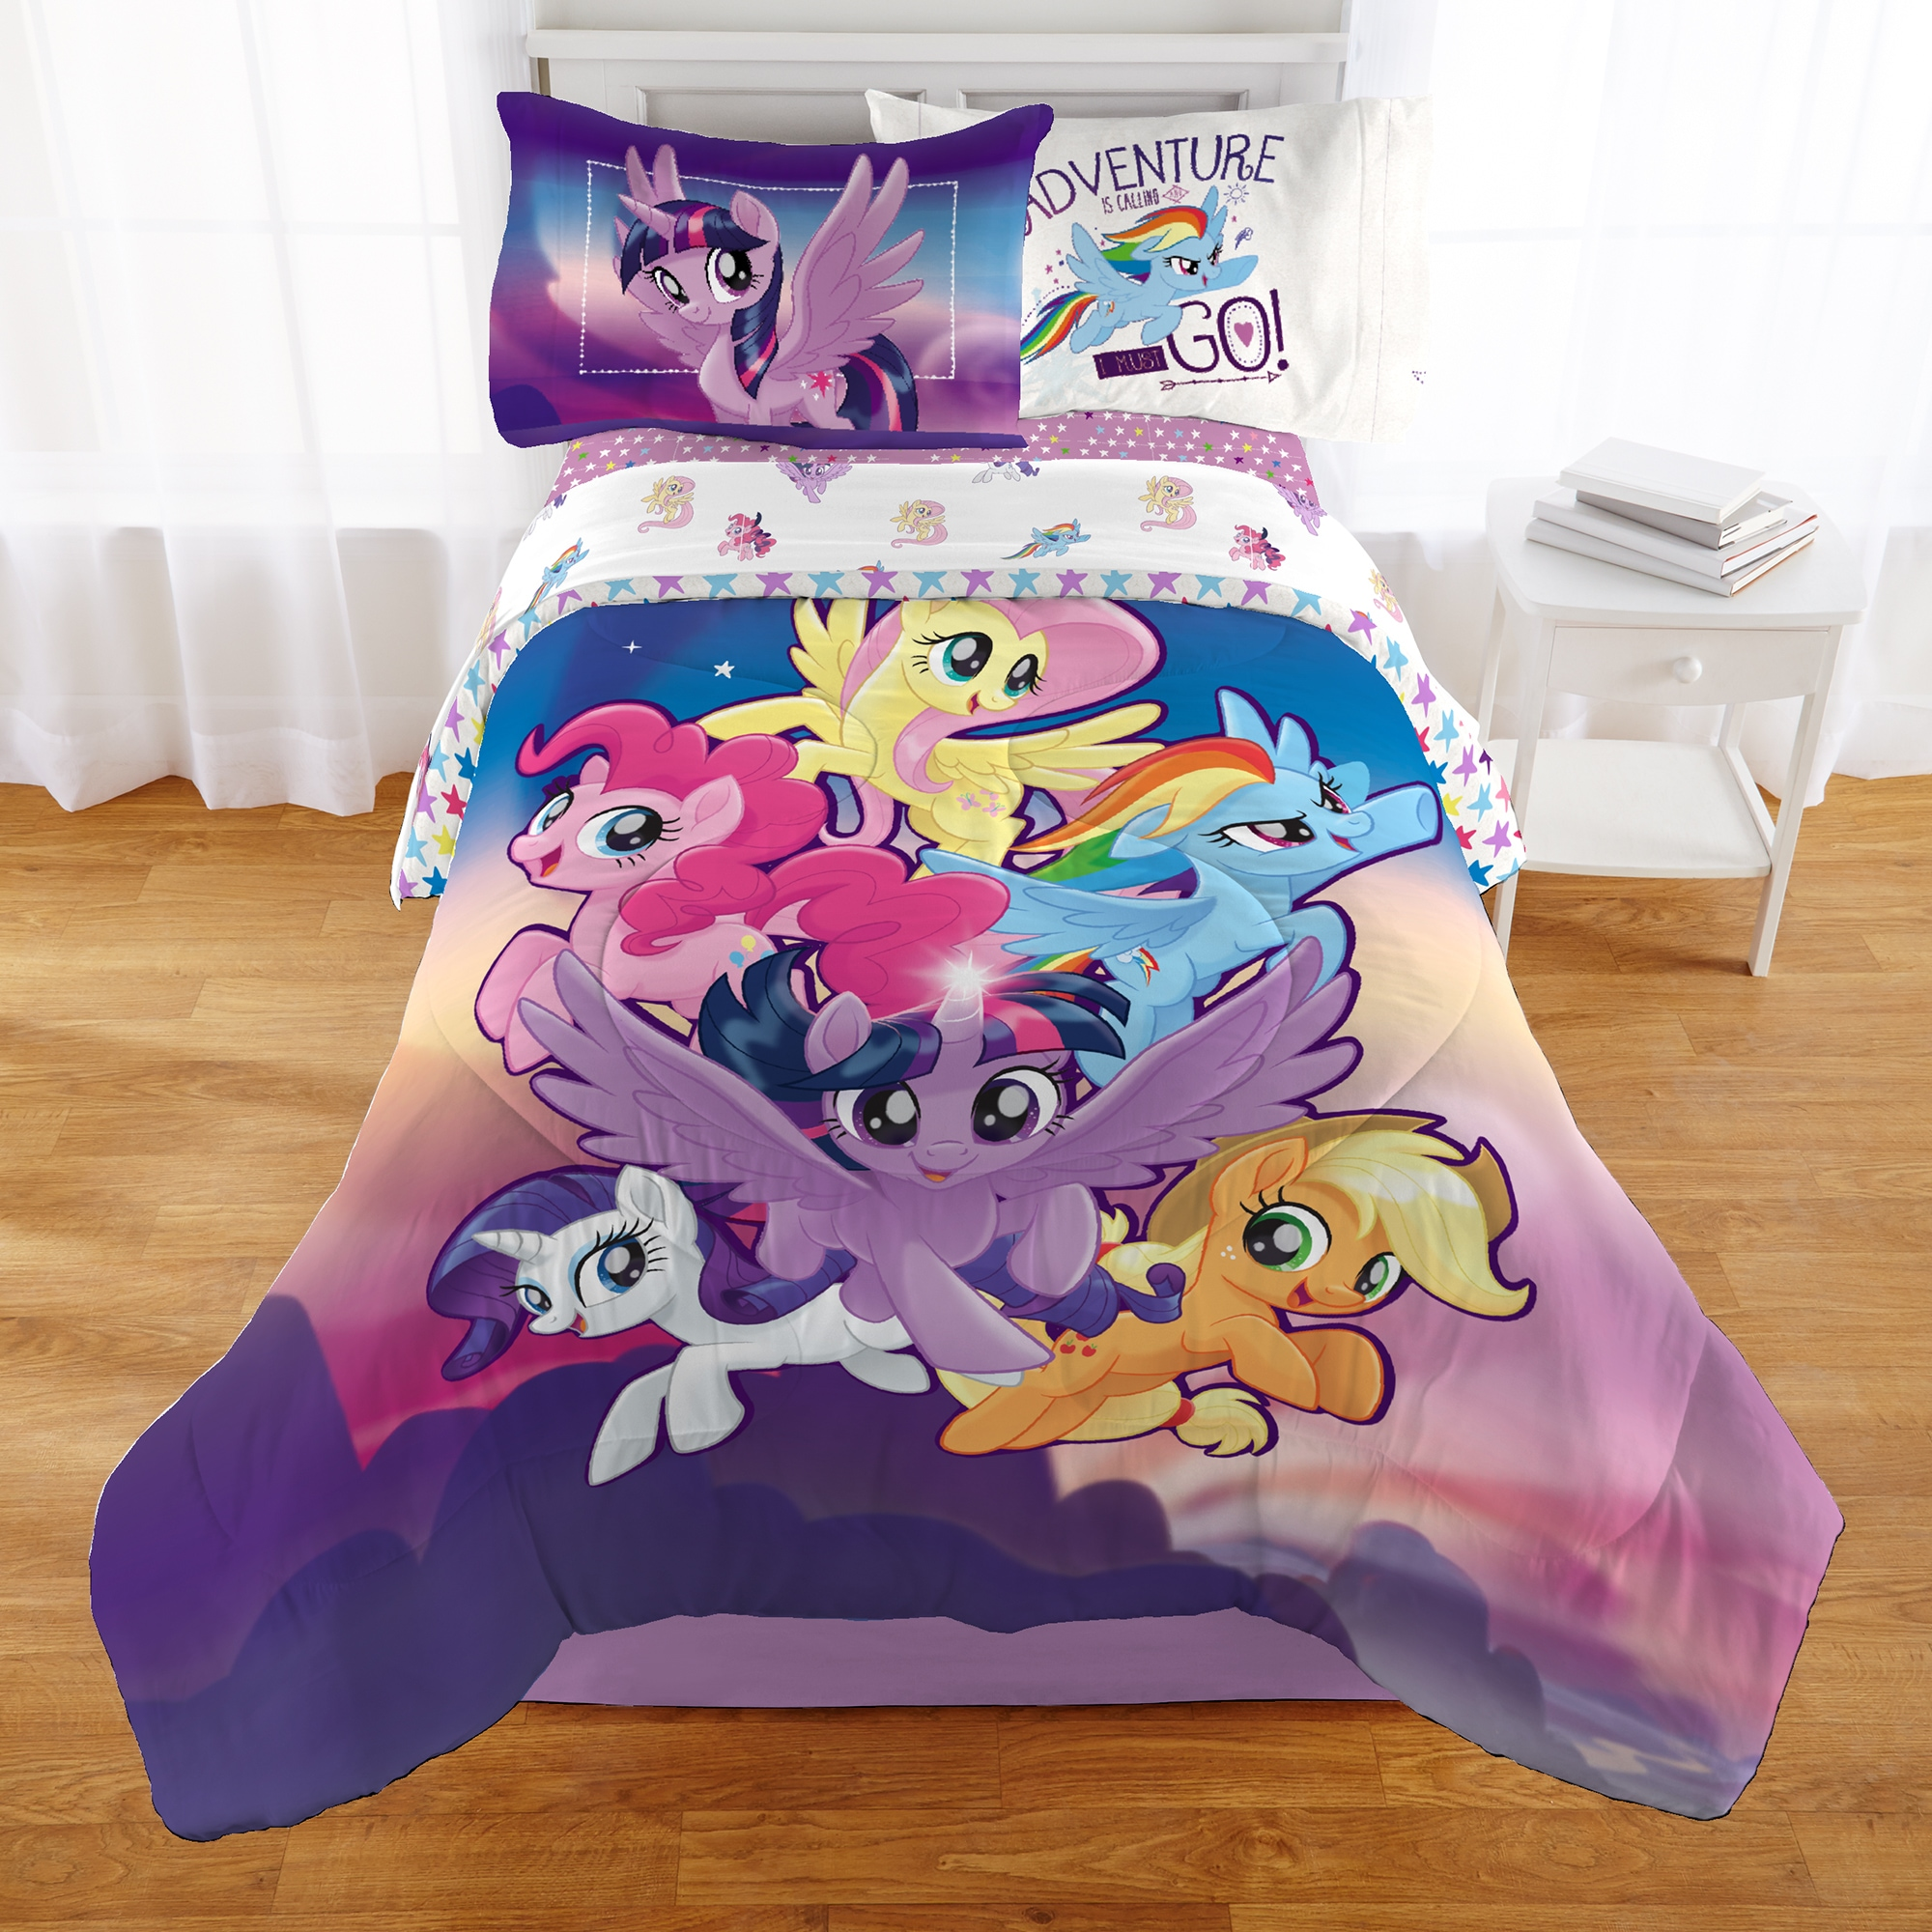 My Little Pony Toddler Bed Set Duvet Pillow /& Duvet Cover 4 in 1 Bed in a Bag